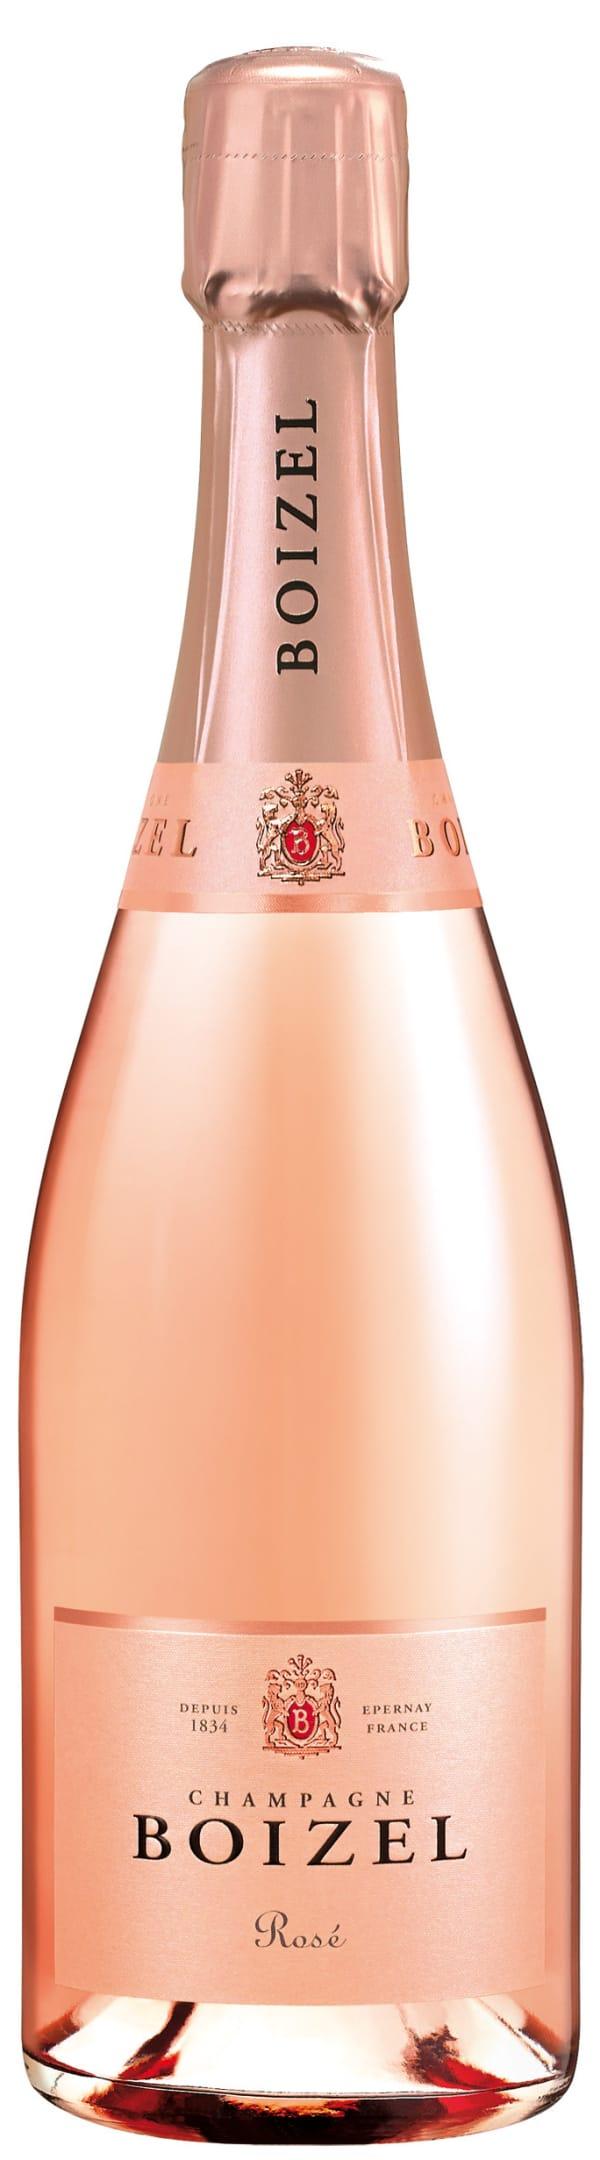 Boizel Rosé Champagne Brut